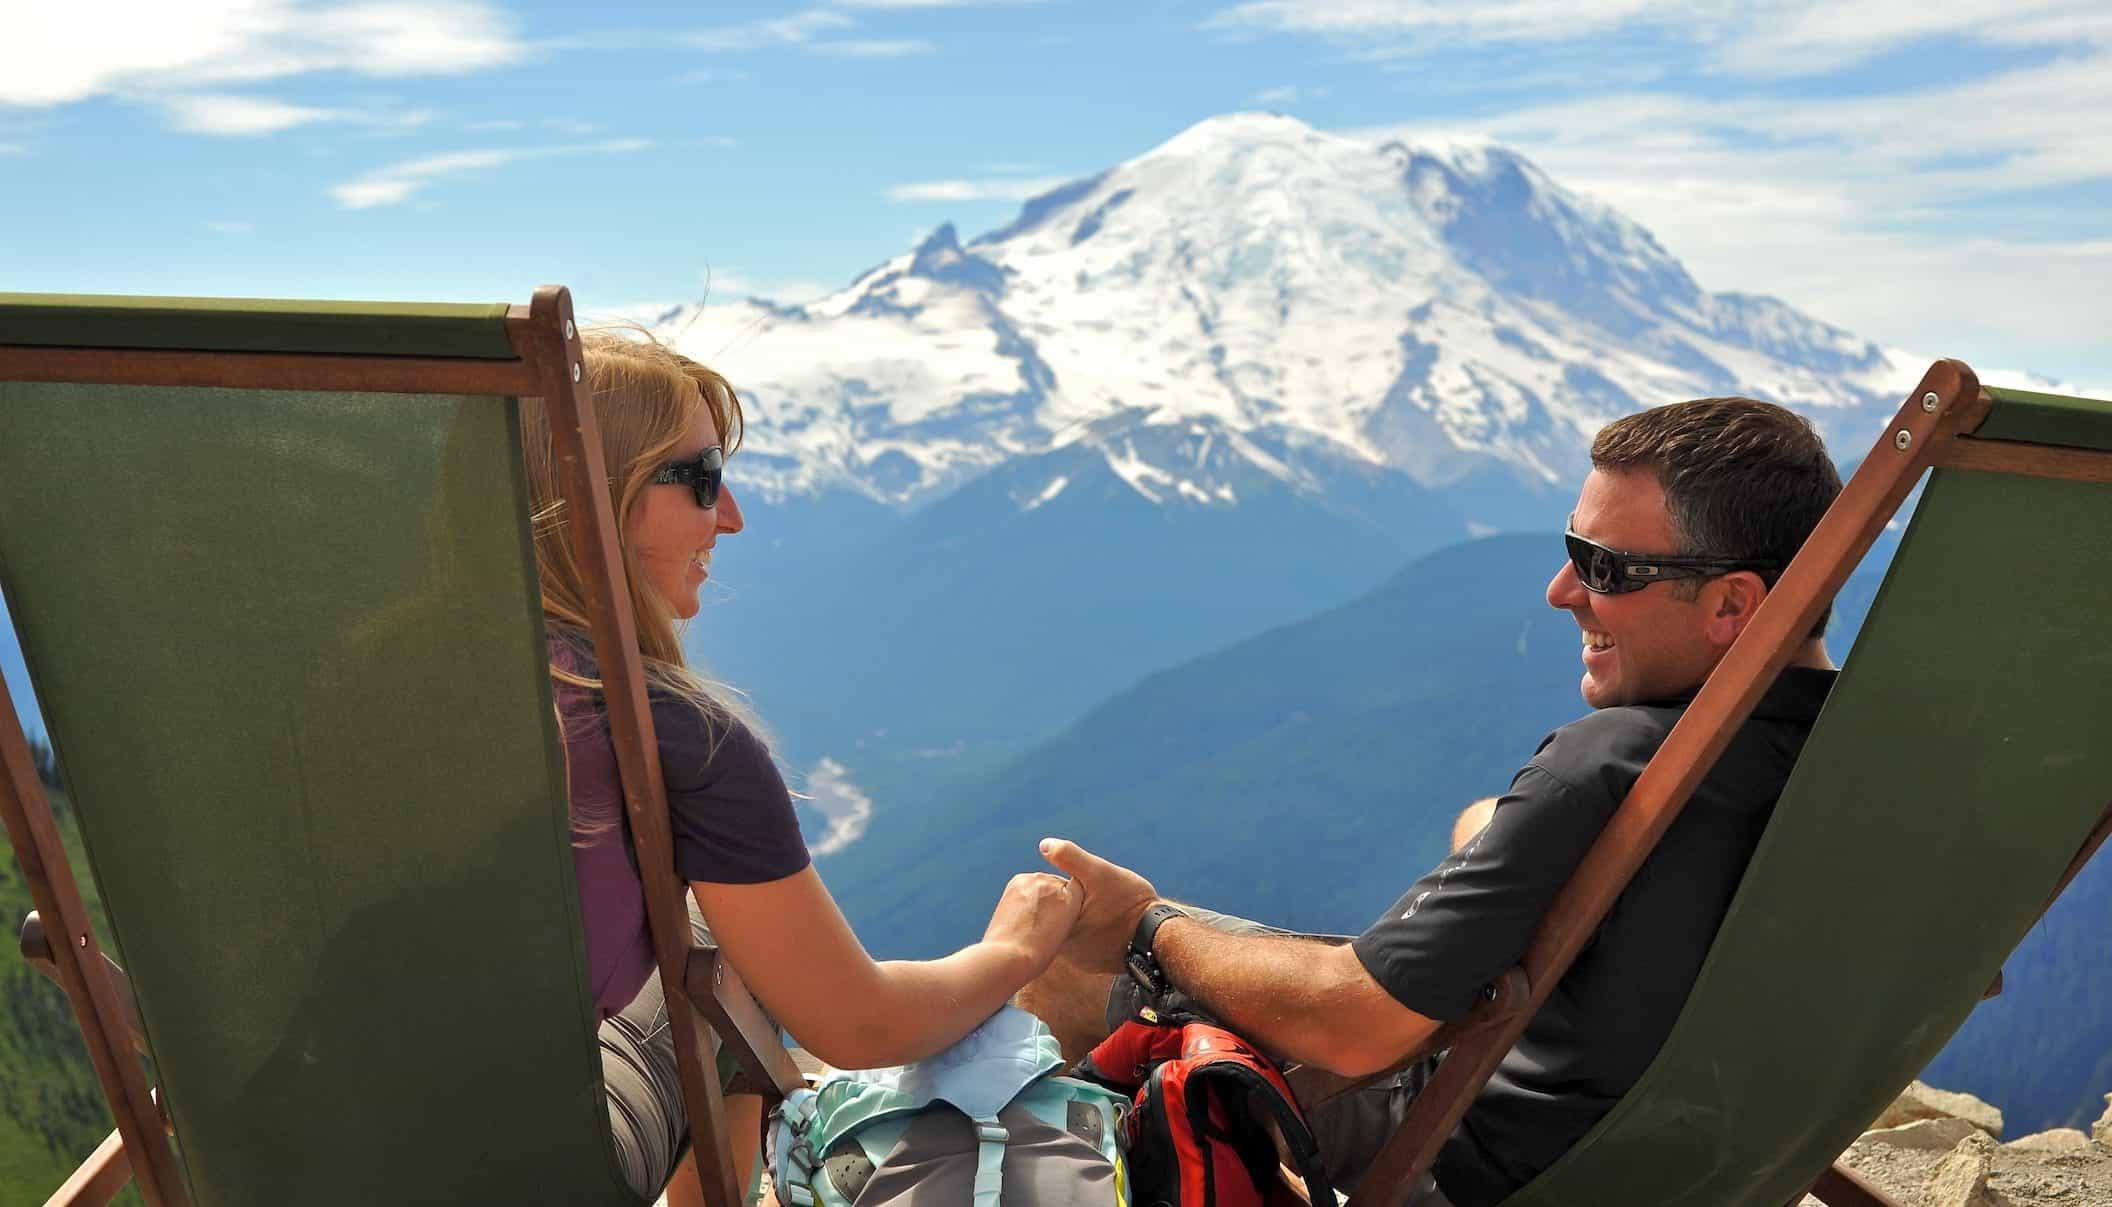 Crystal Mountain photo courtesy Jason Anglin